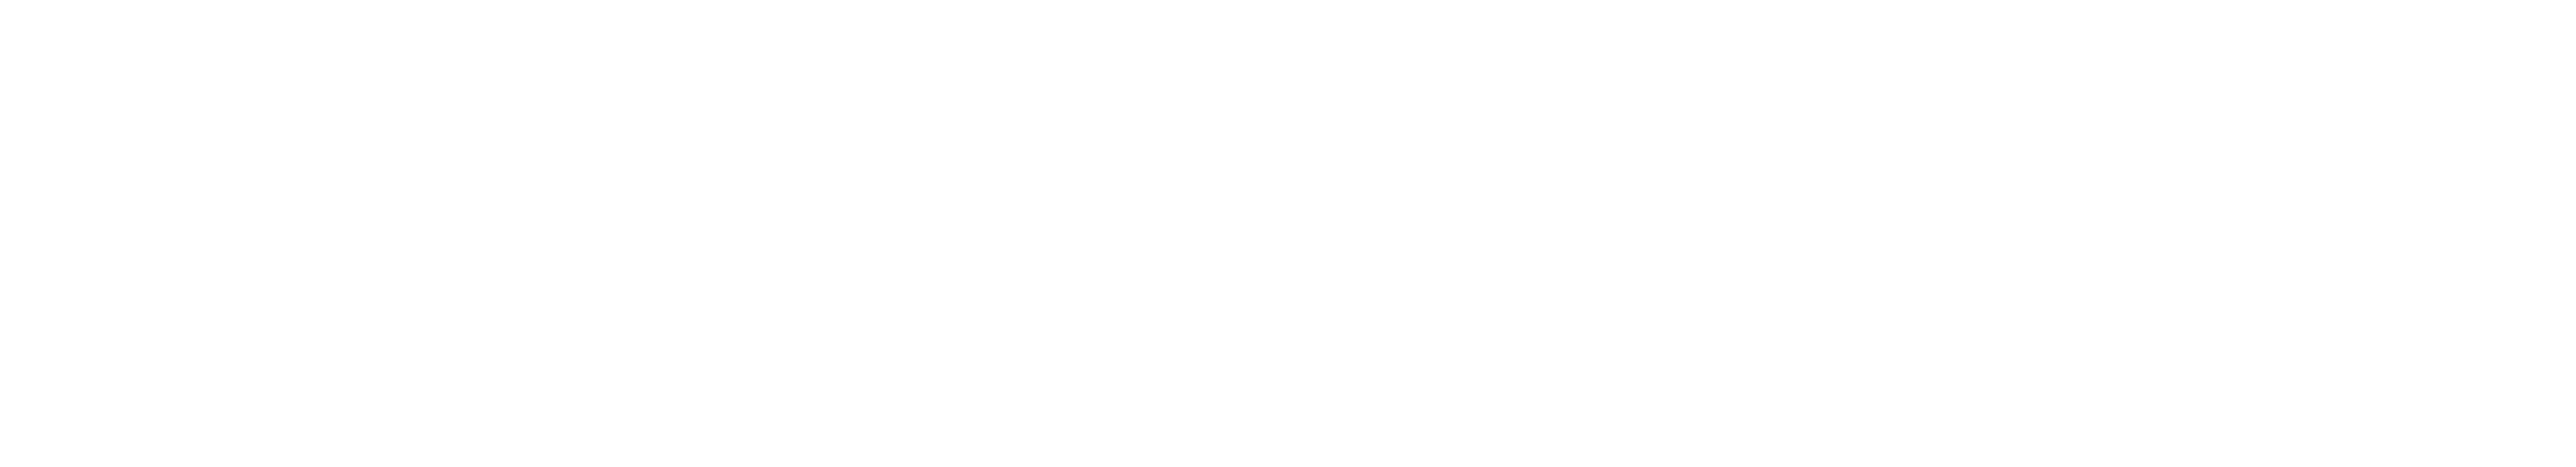 Ceramic flat sheet membrane - CERAFILTEC - Logo